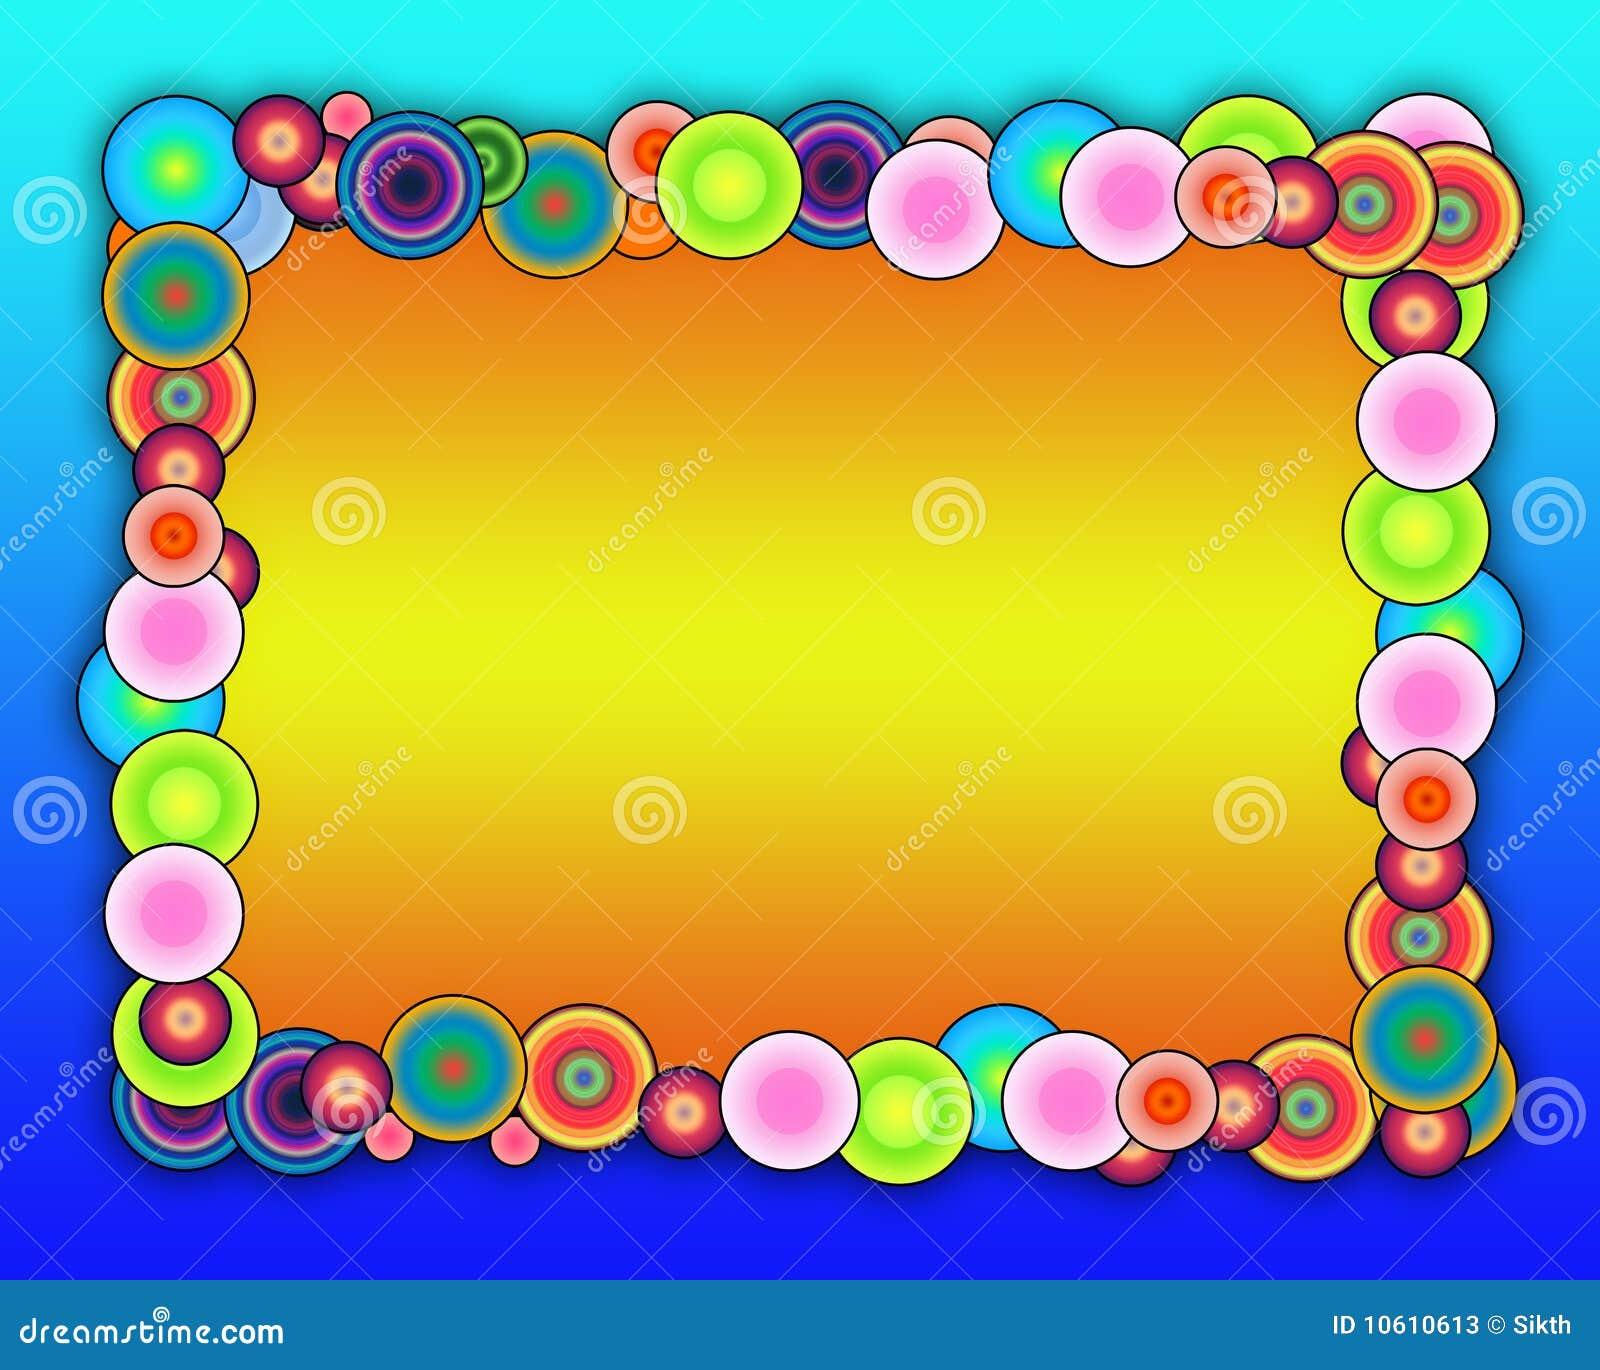 Bubbly Frame stock illustration. Illustration of decorative - 10610613